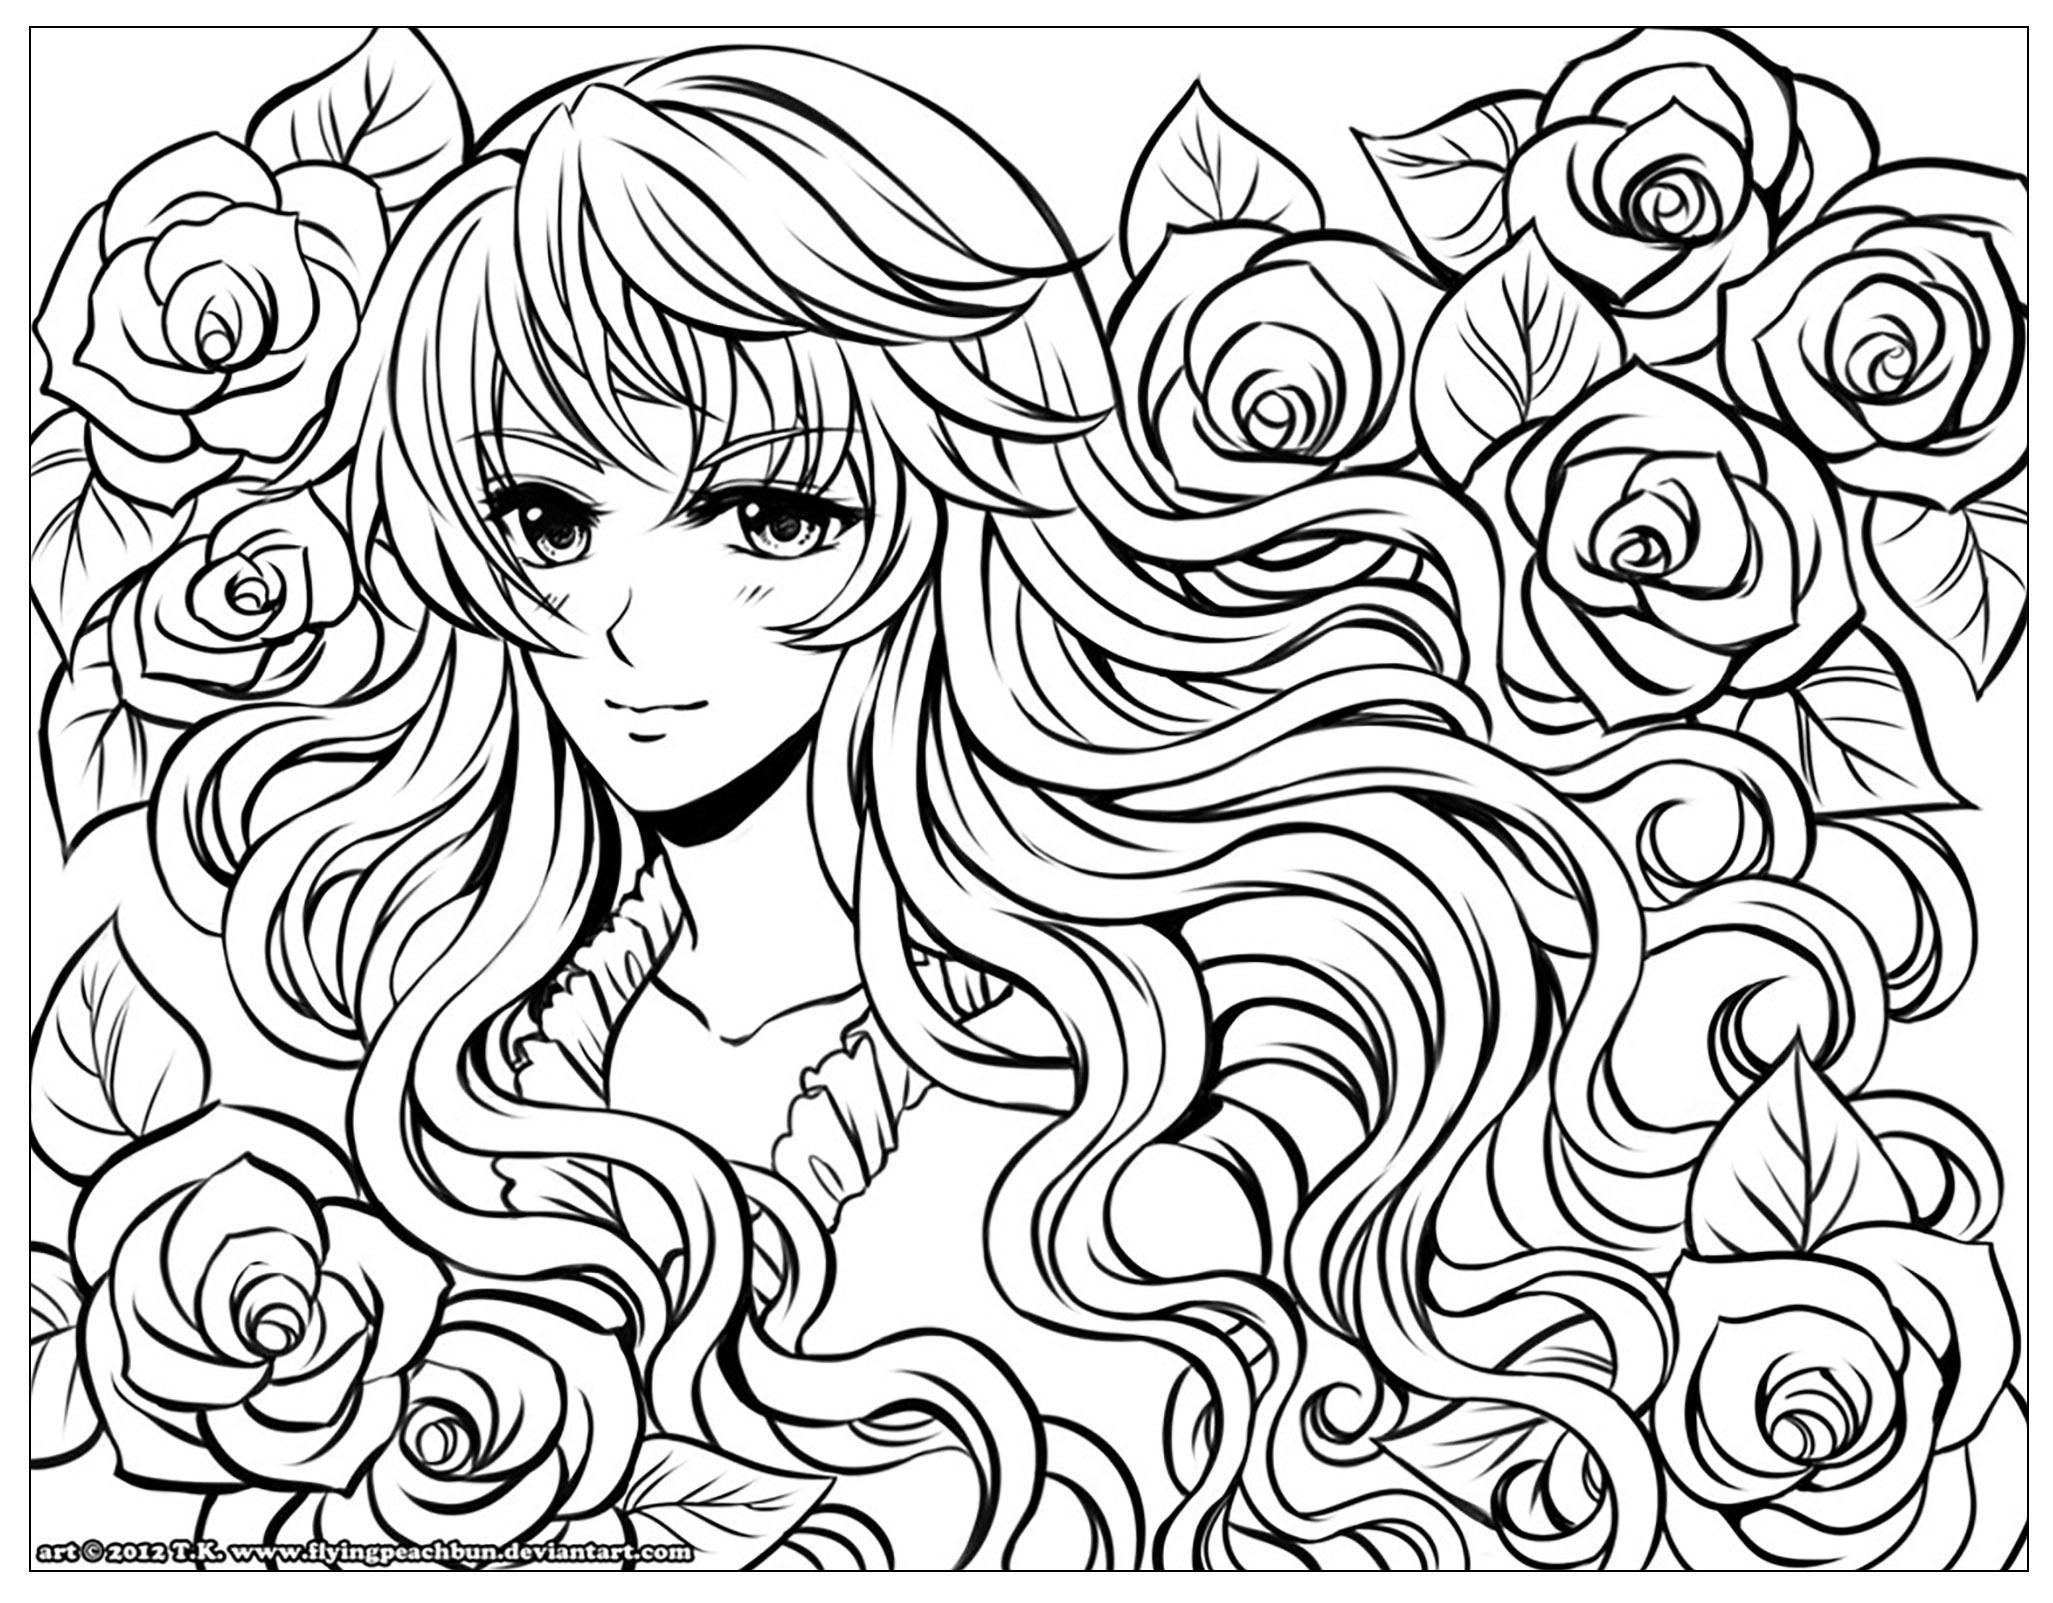 Justcolor Manga 5 - Coloriages De Mangas Et D'animes - 100 tout Coloriage Manga Kawaii